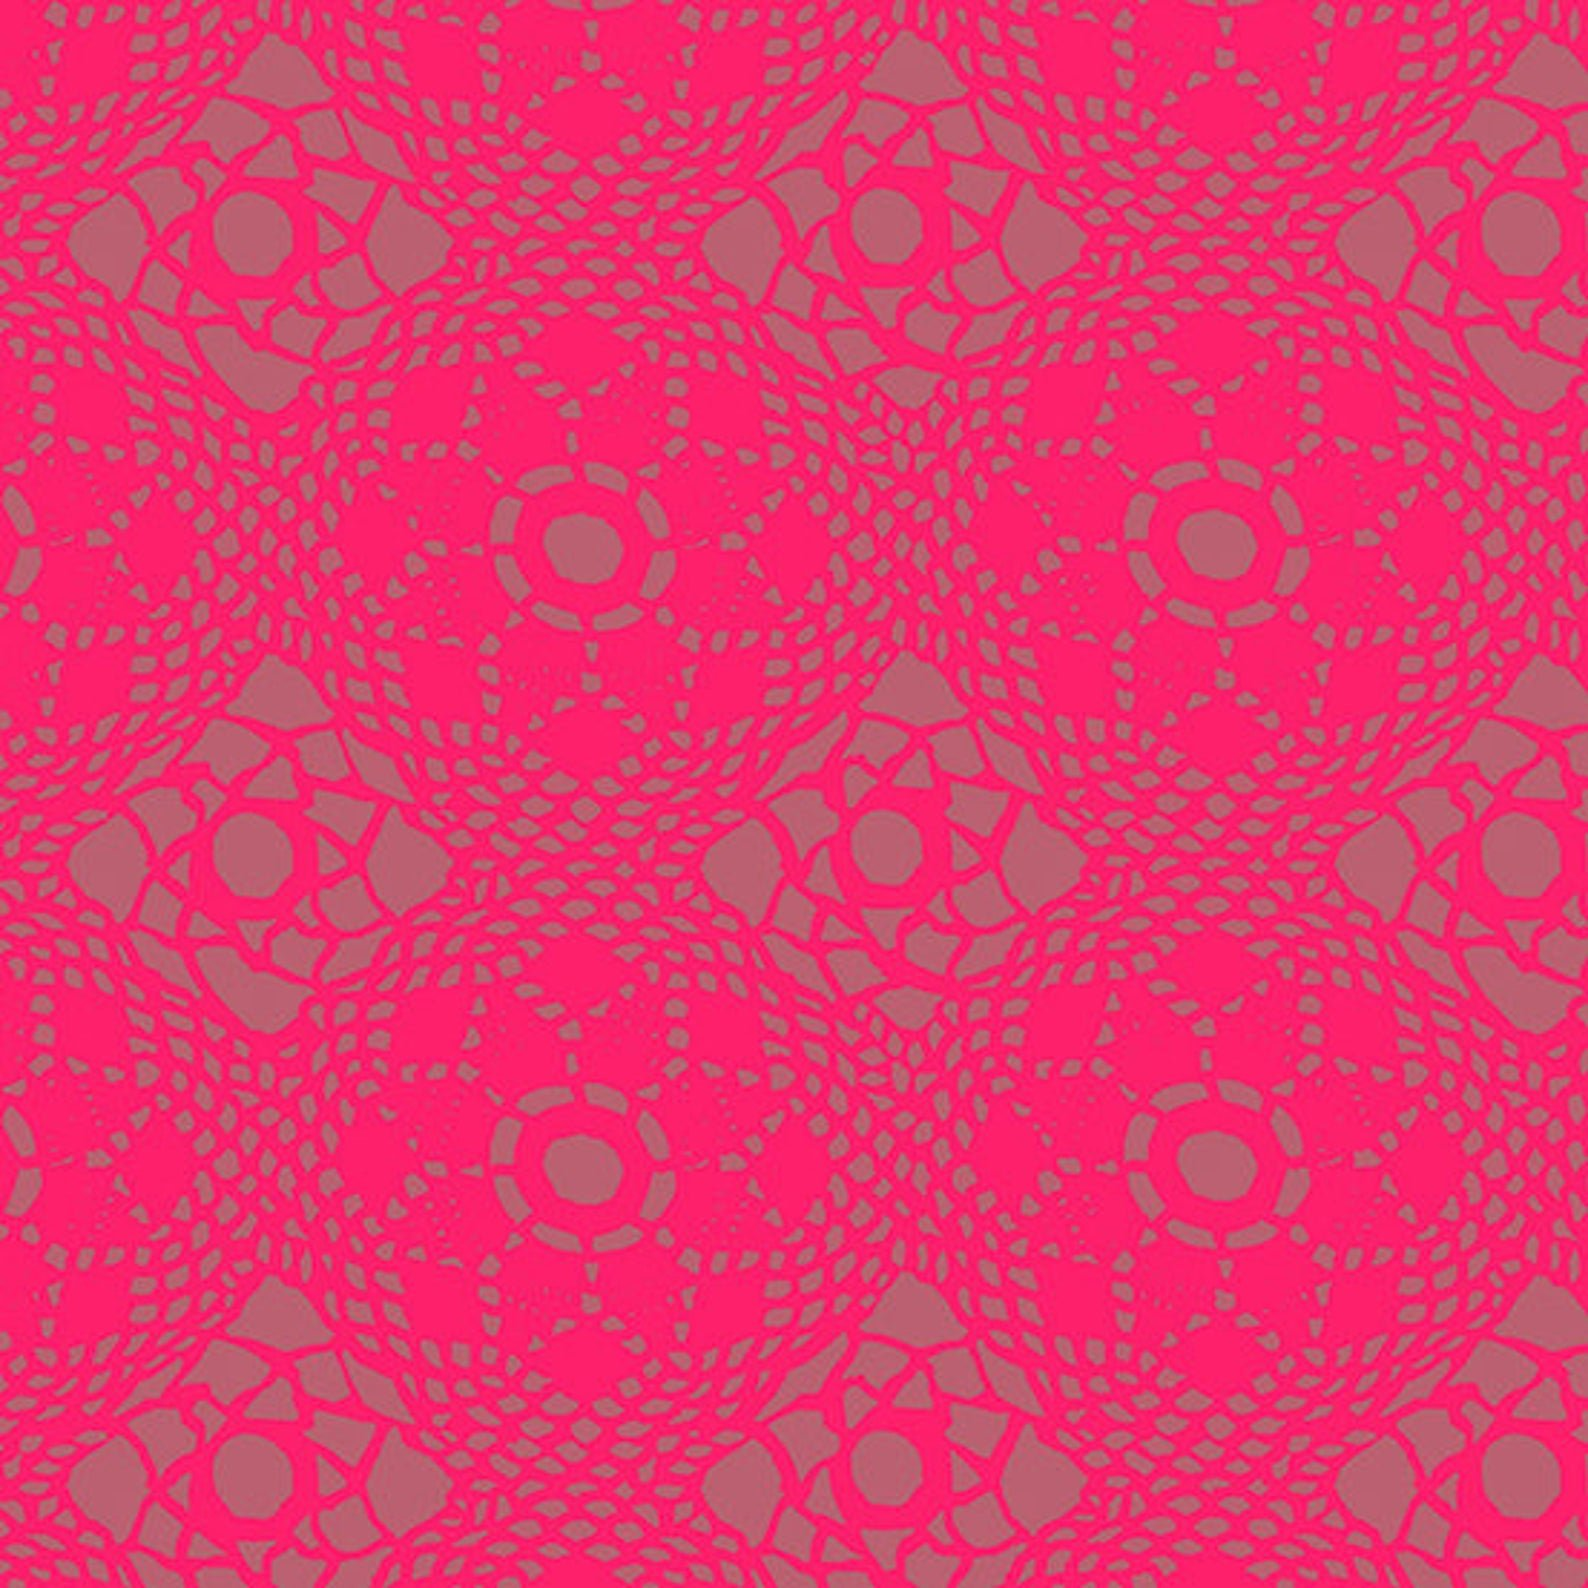 Strawberry Crochet Sun Print 2021 by Alison Glass - Fat Quarter